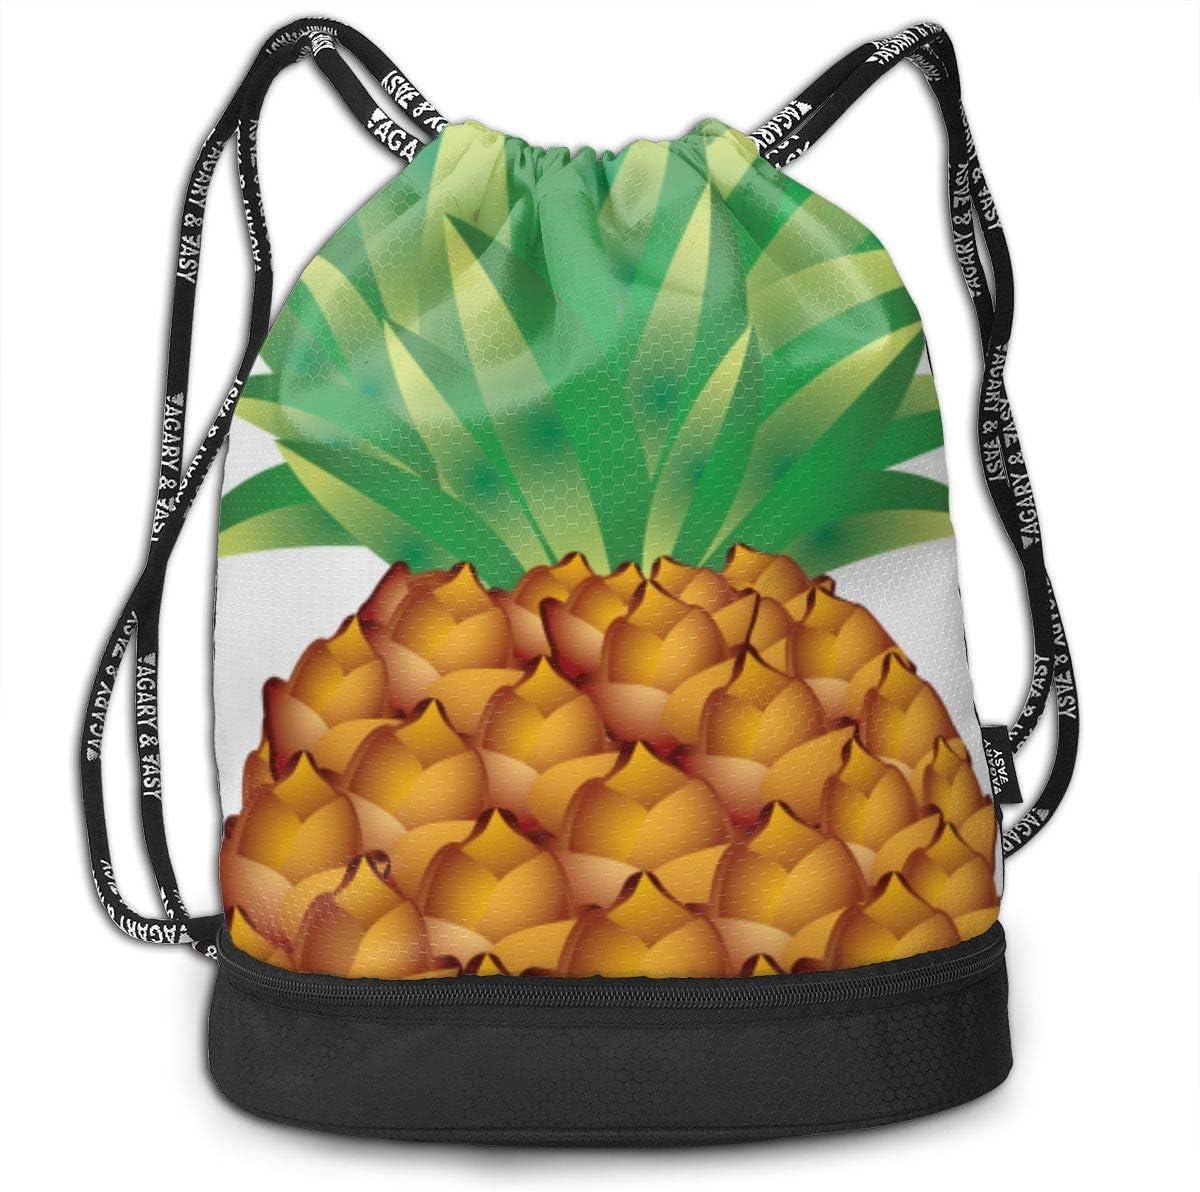 Golden Pineapple Print Drawstring Bag Backpack Sport Travel Gym School Hiking Yoga Beach Cinch Bags Bundle Backpack For Women//Men